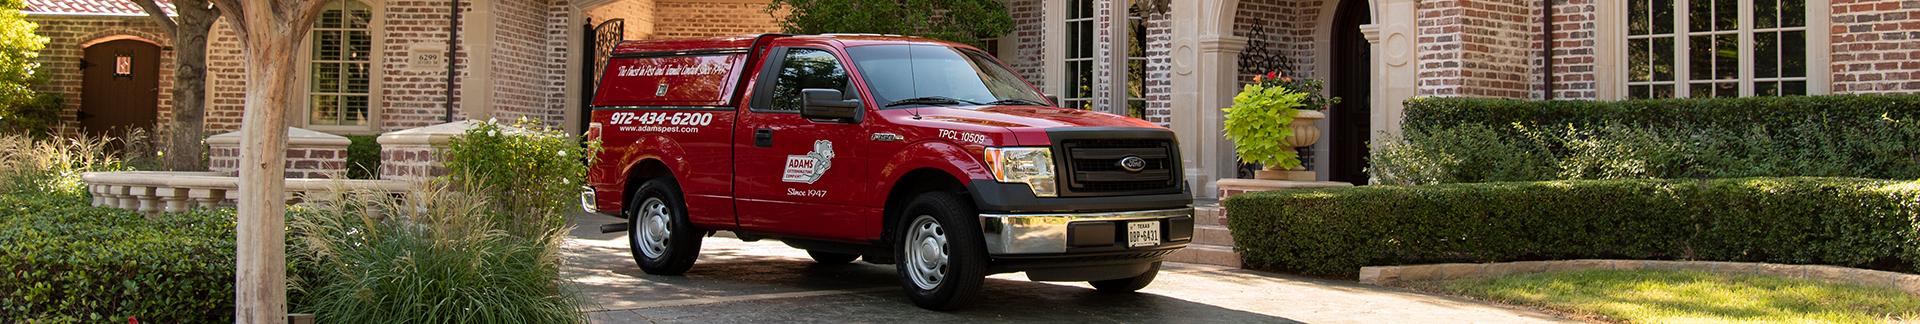 adams pest control's truck in university park tx